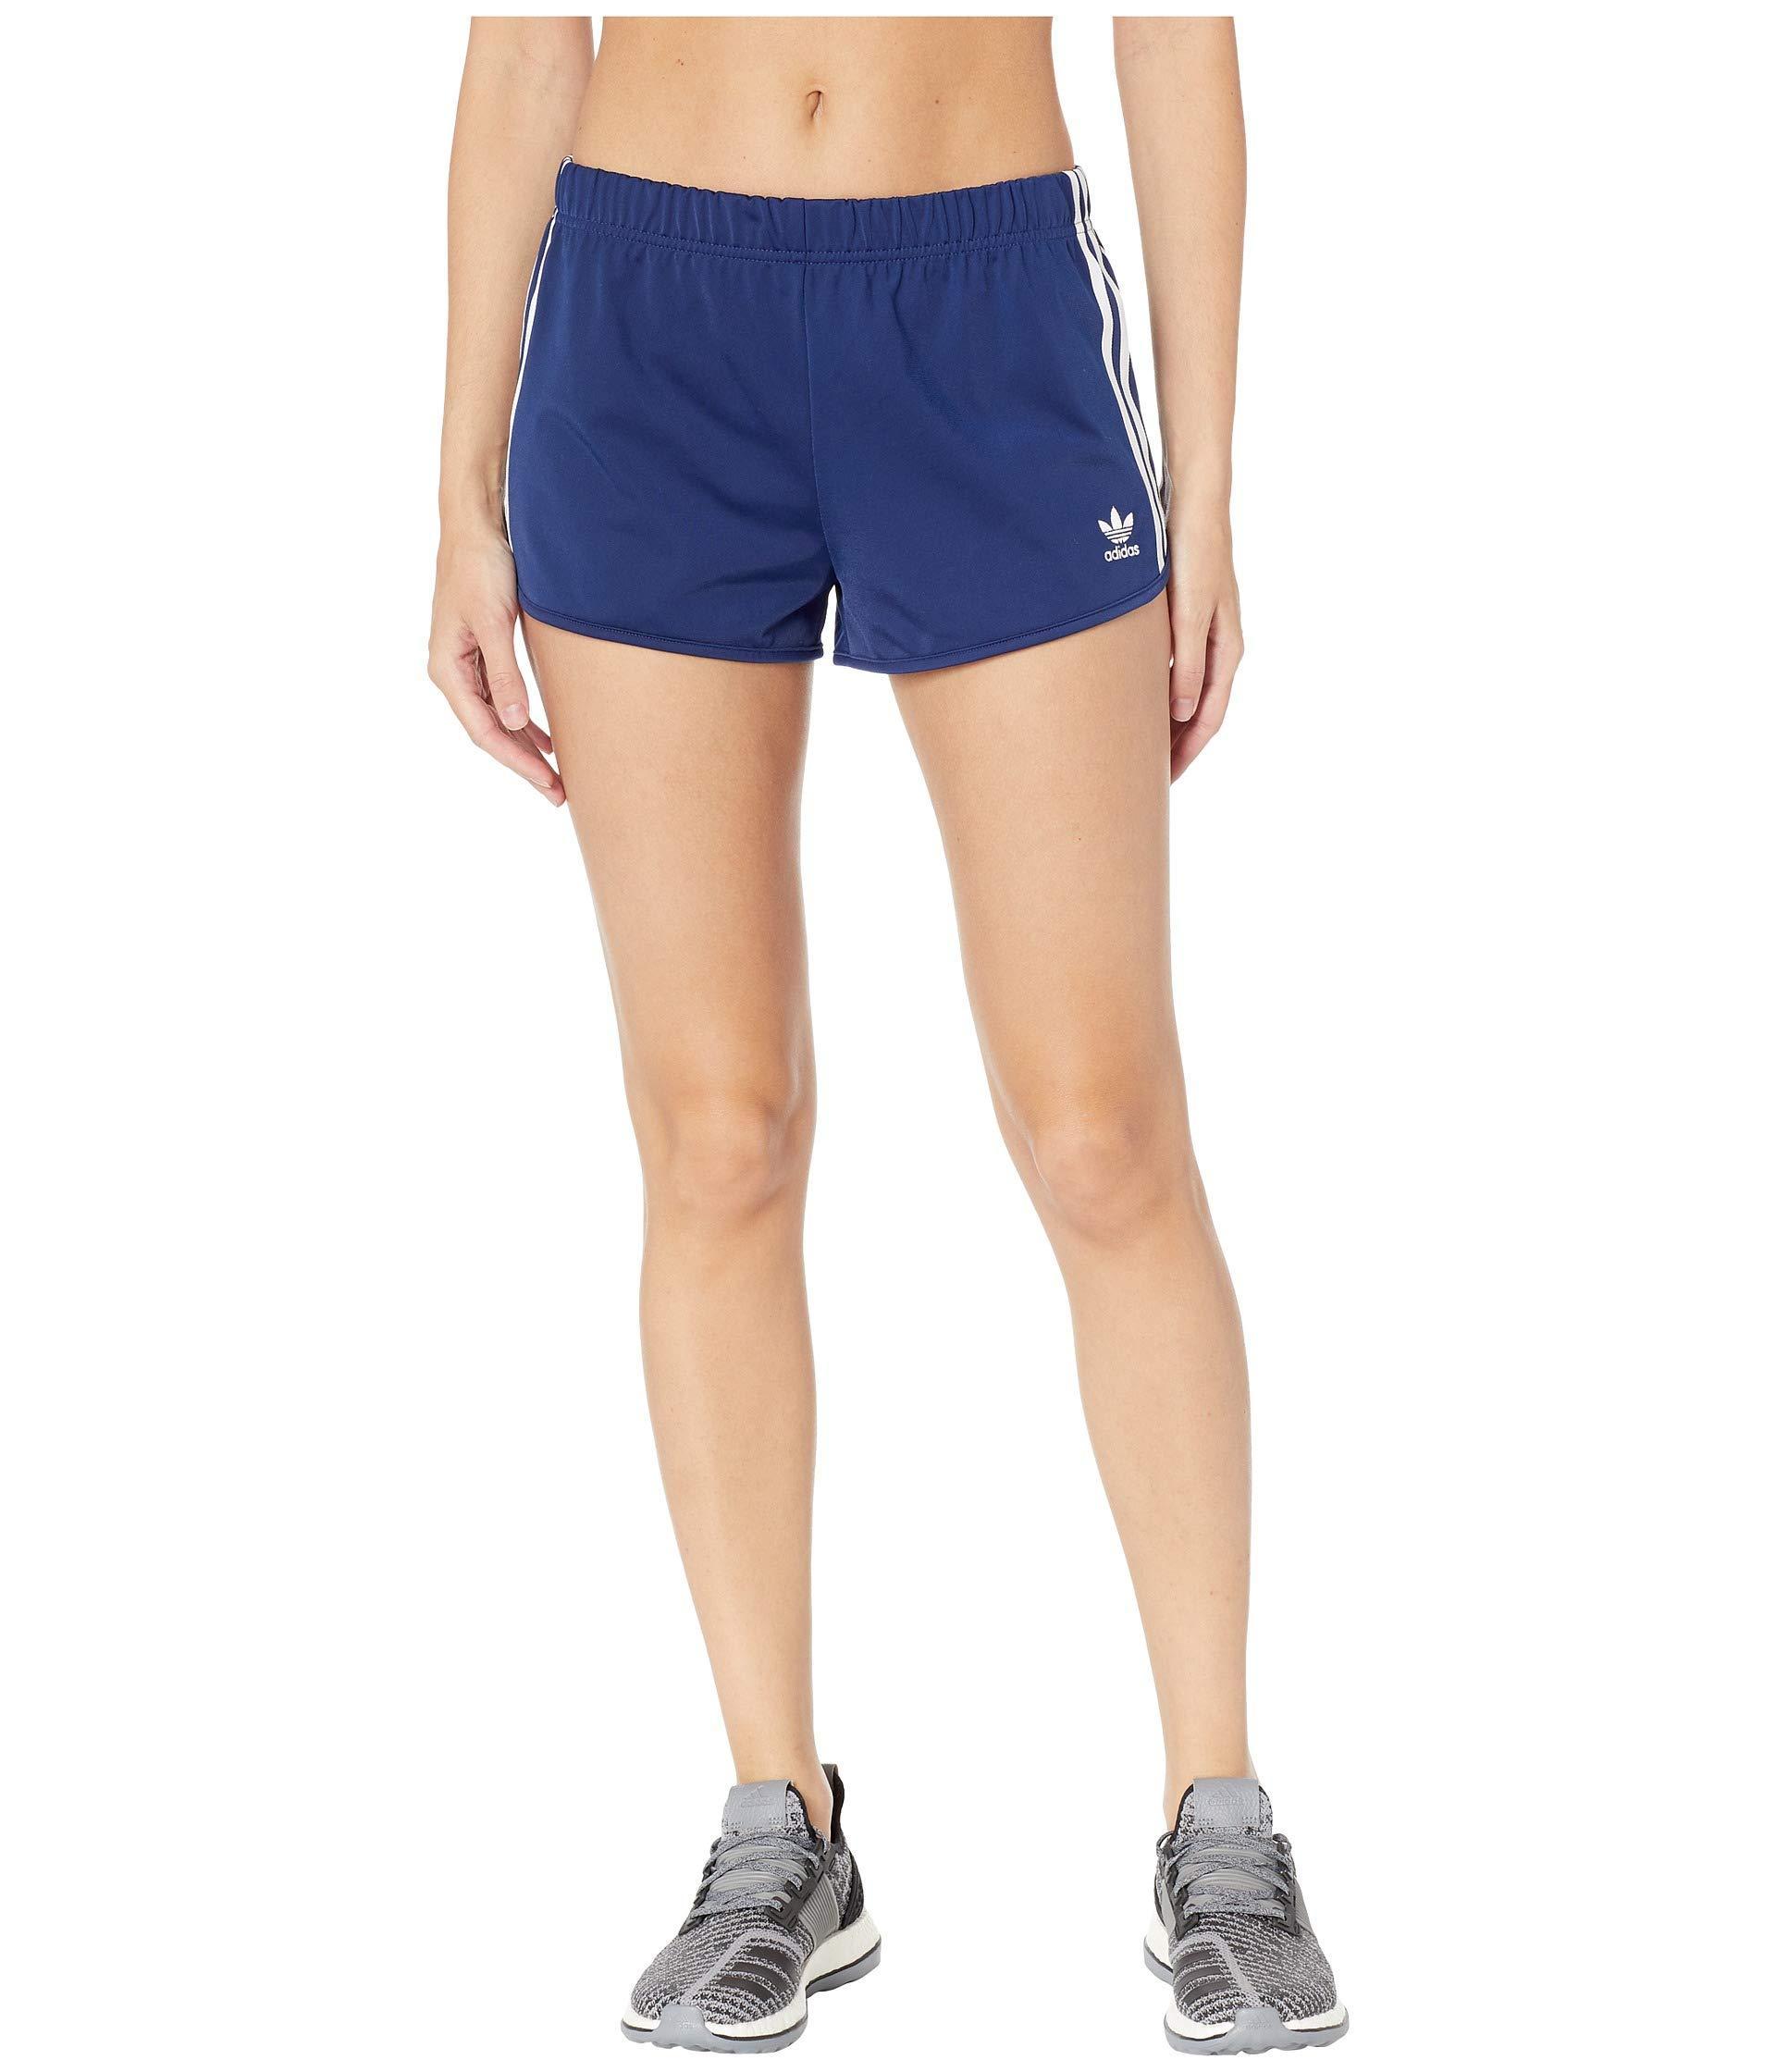 e58f25626 adidas Originals 3-stripes Shorts (purple Glow) Women's Shorts in ...